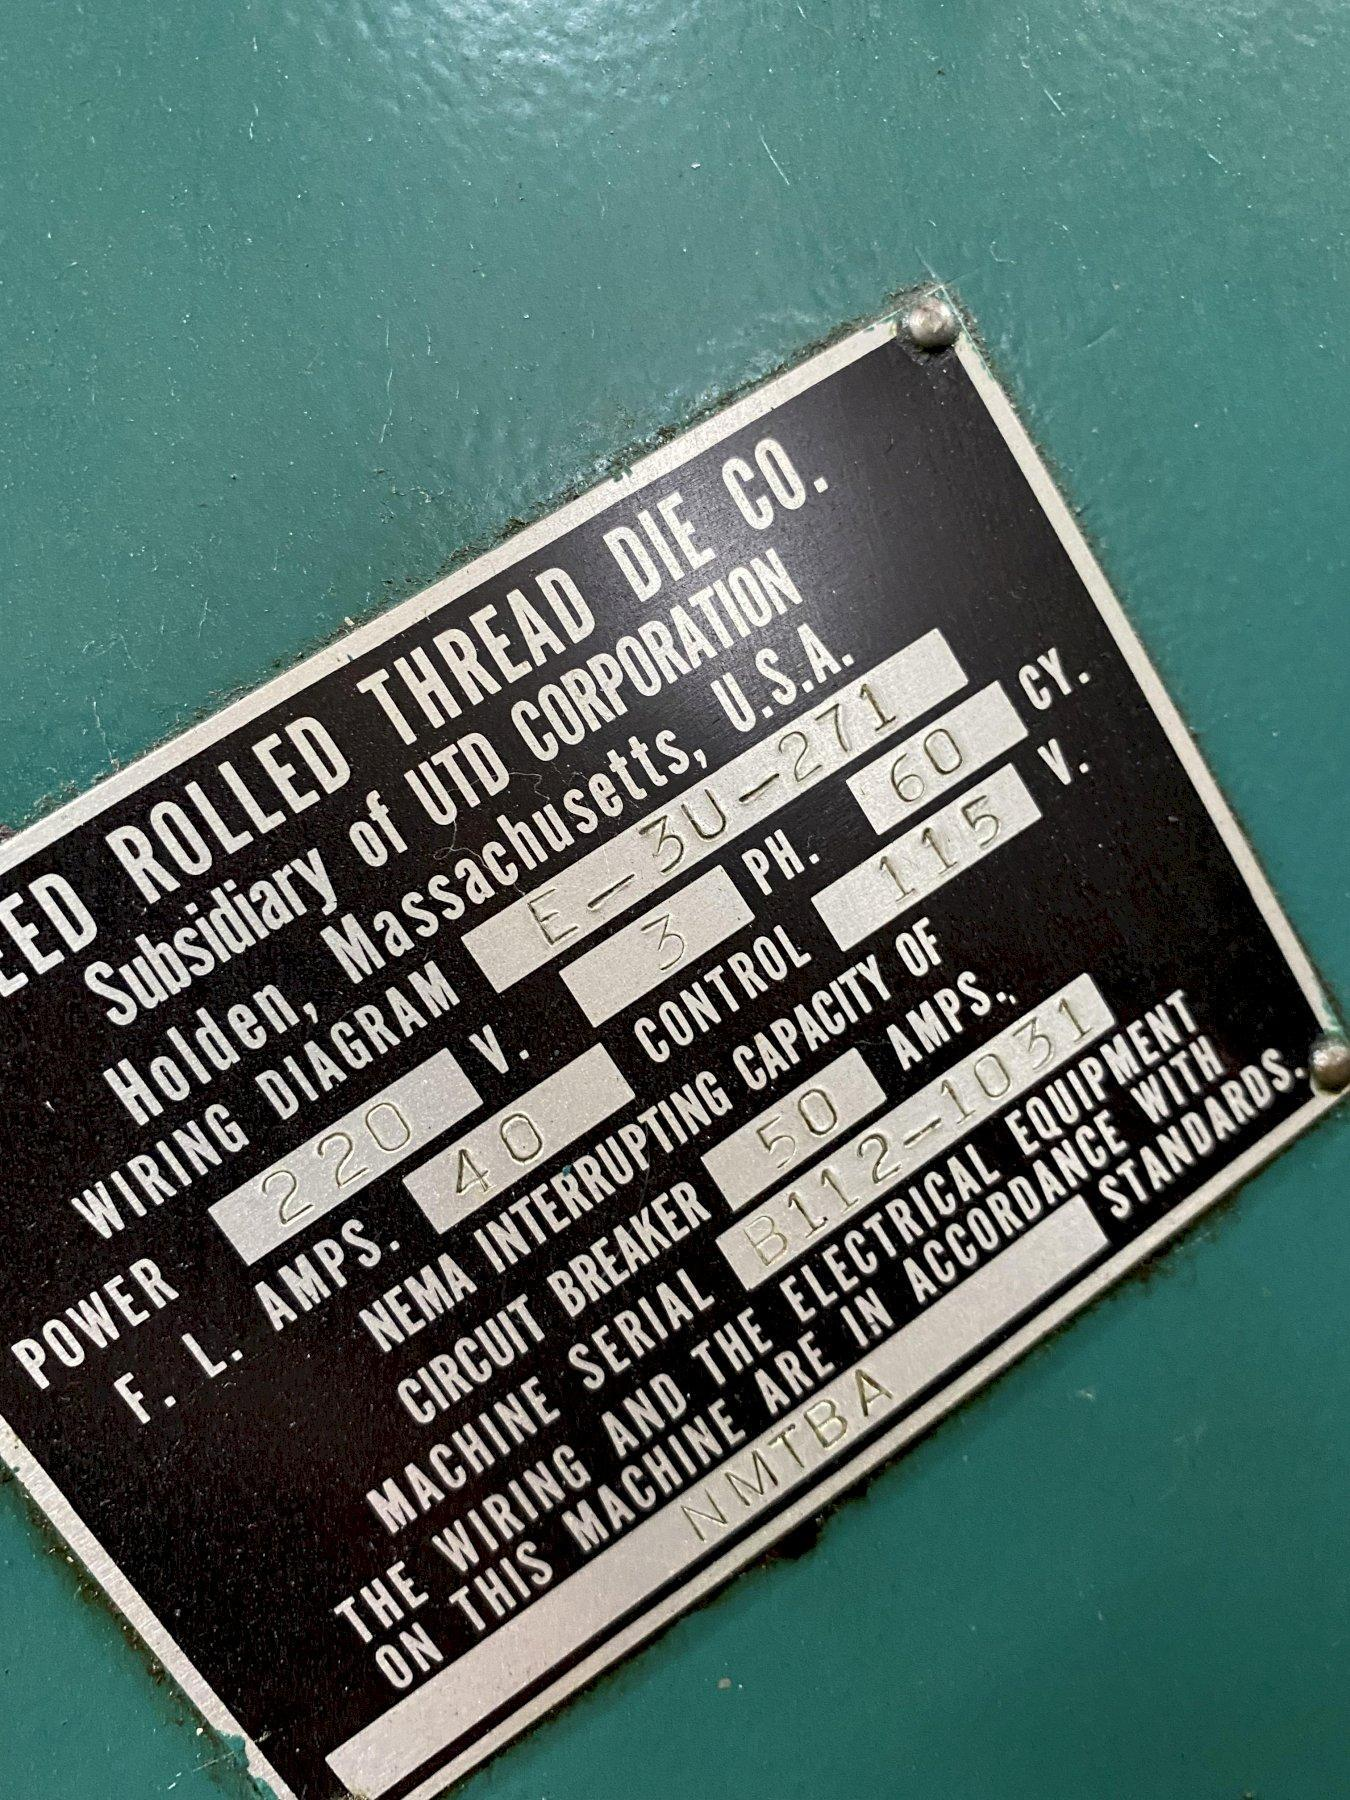 "2-1/2"" REED B-112 CYLINDRICAL 2-DIE HORIZ. THREAD ROLLER. STOCK # 0847321"